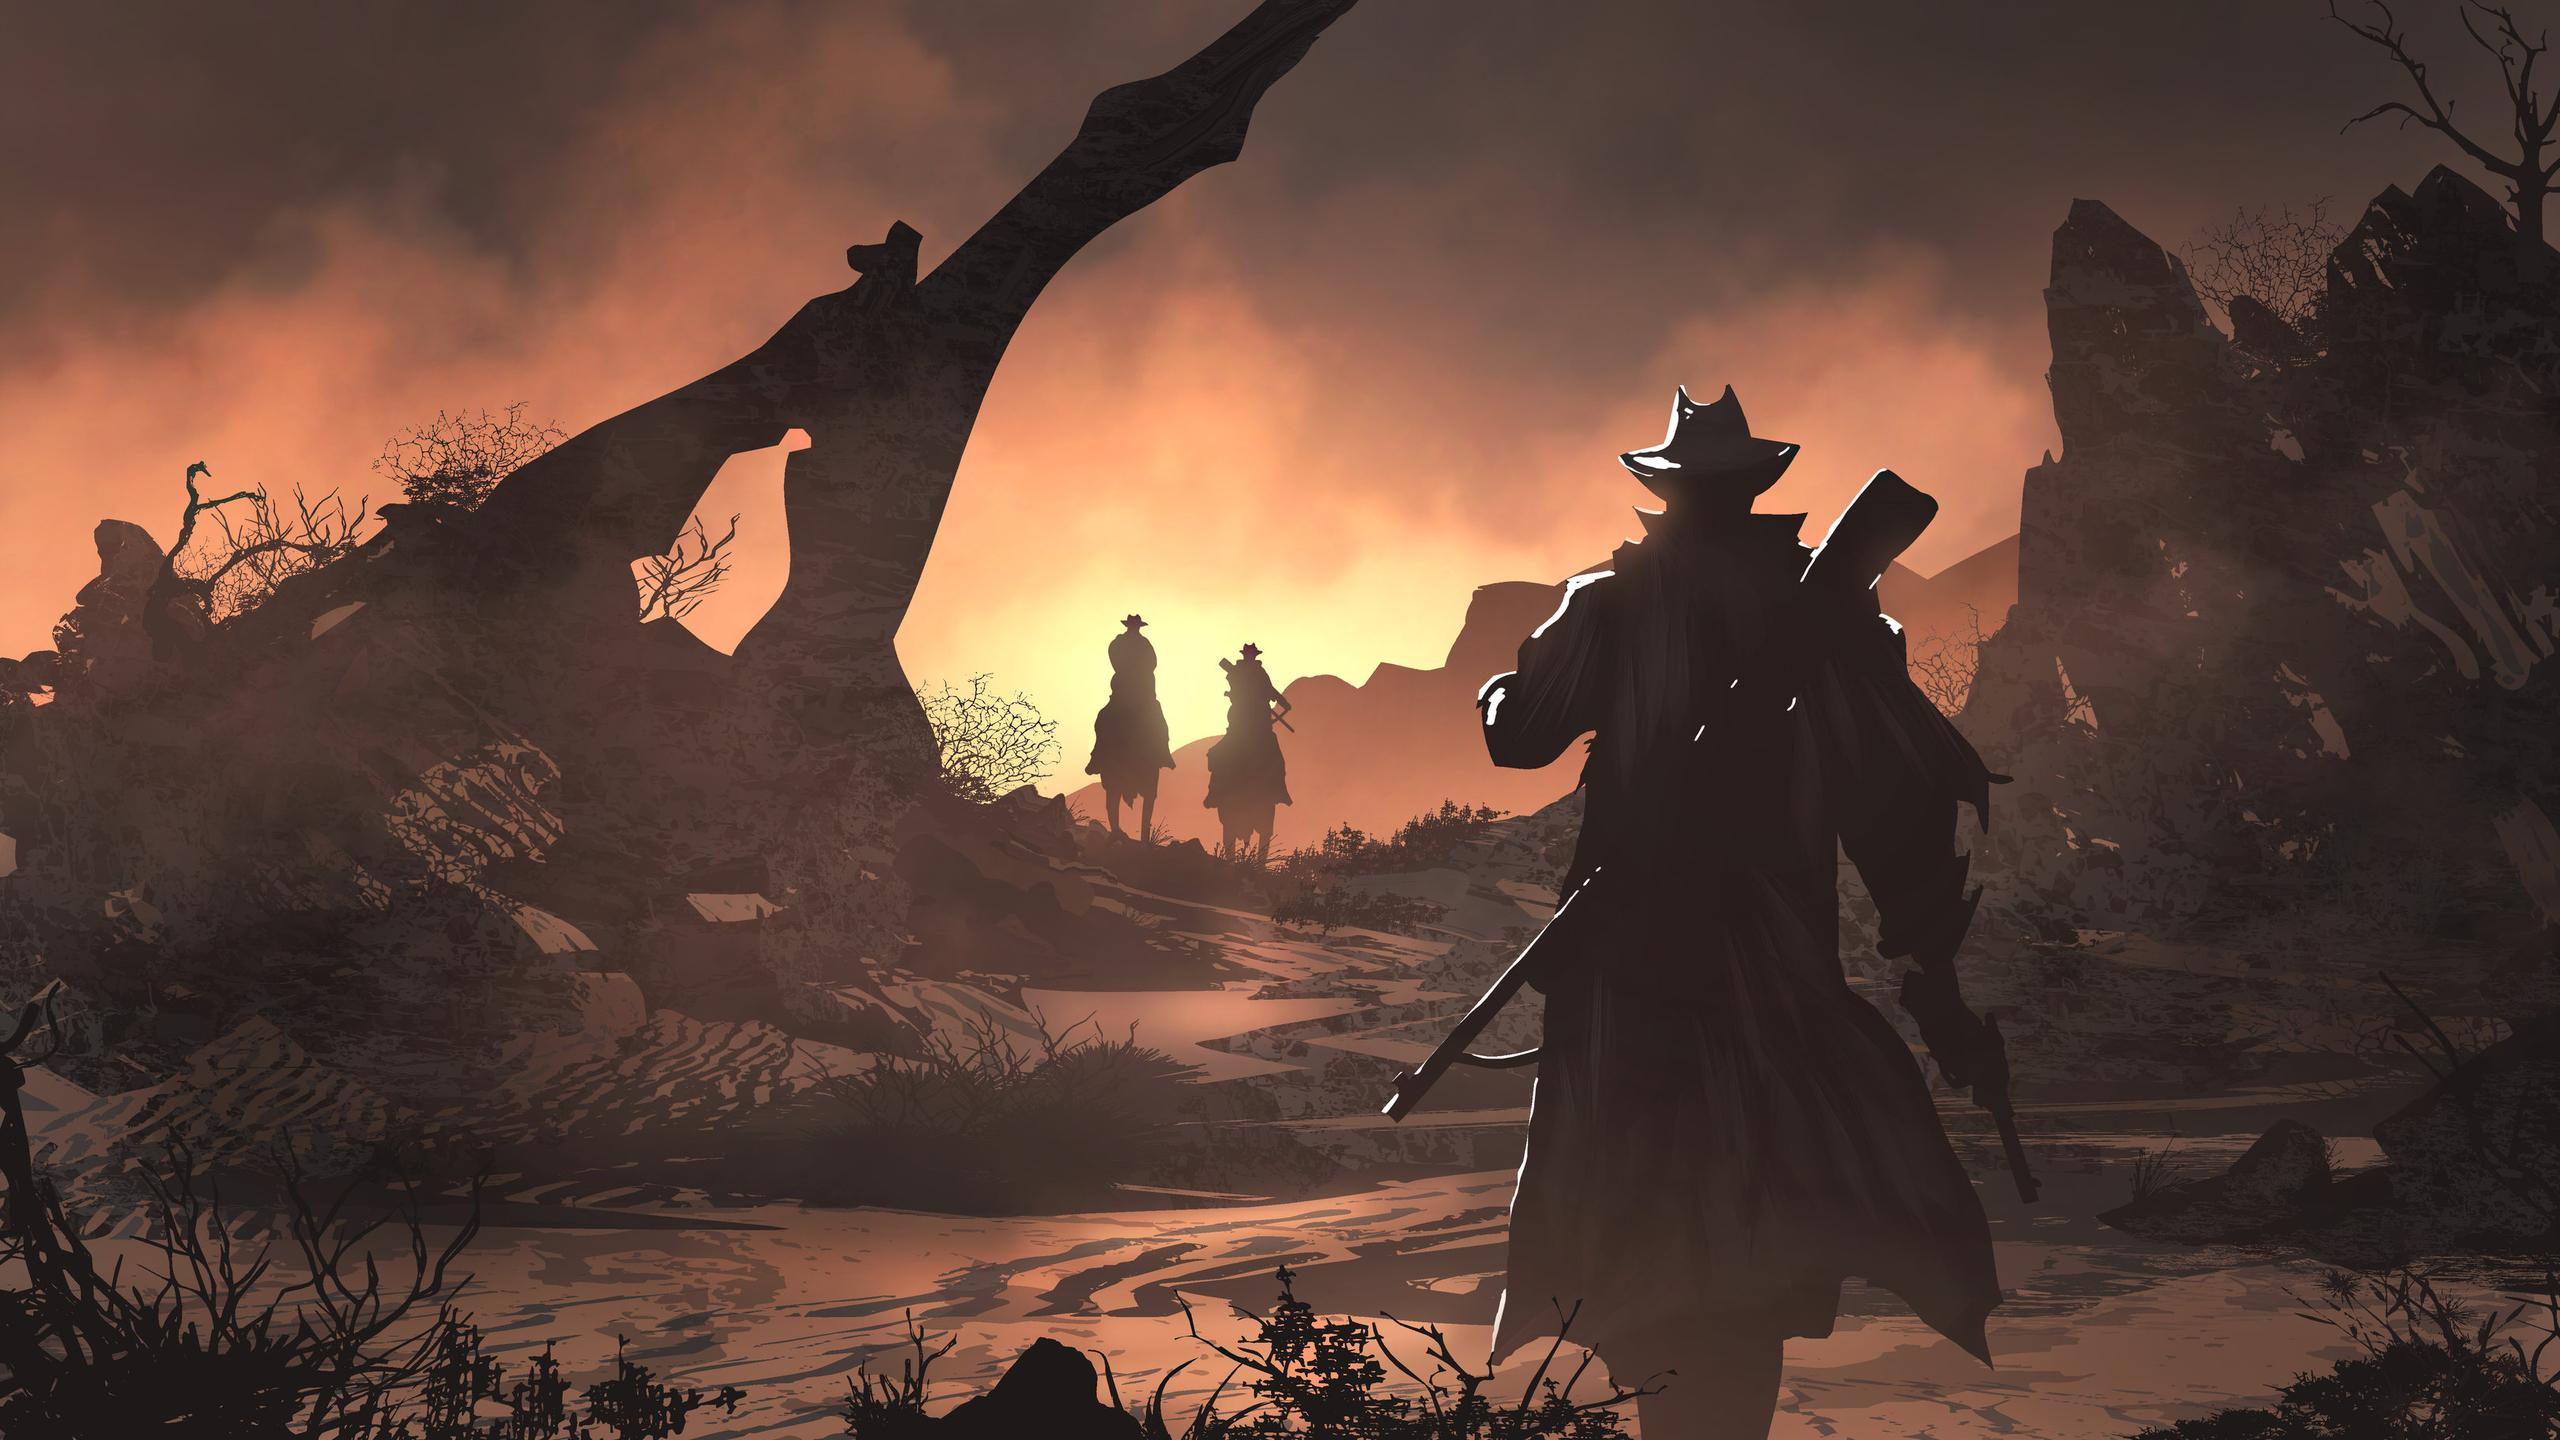 Red Dead Redemption 2 Wallpaper 1440p